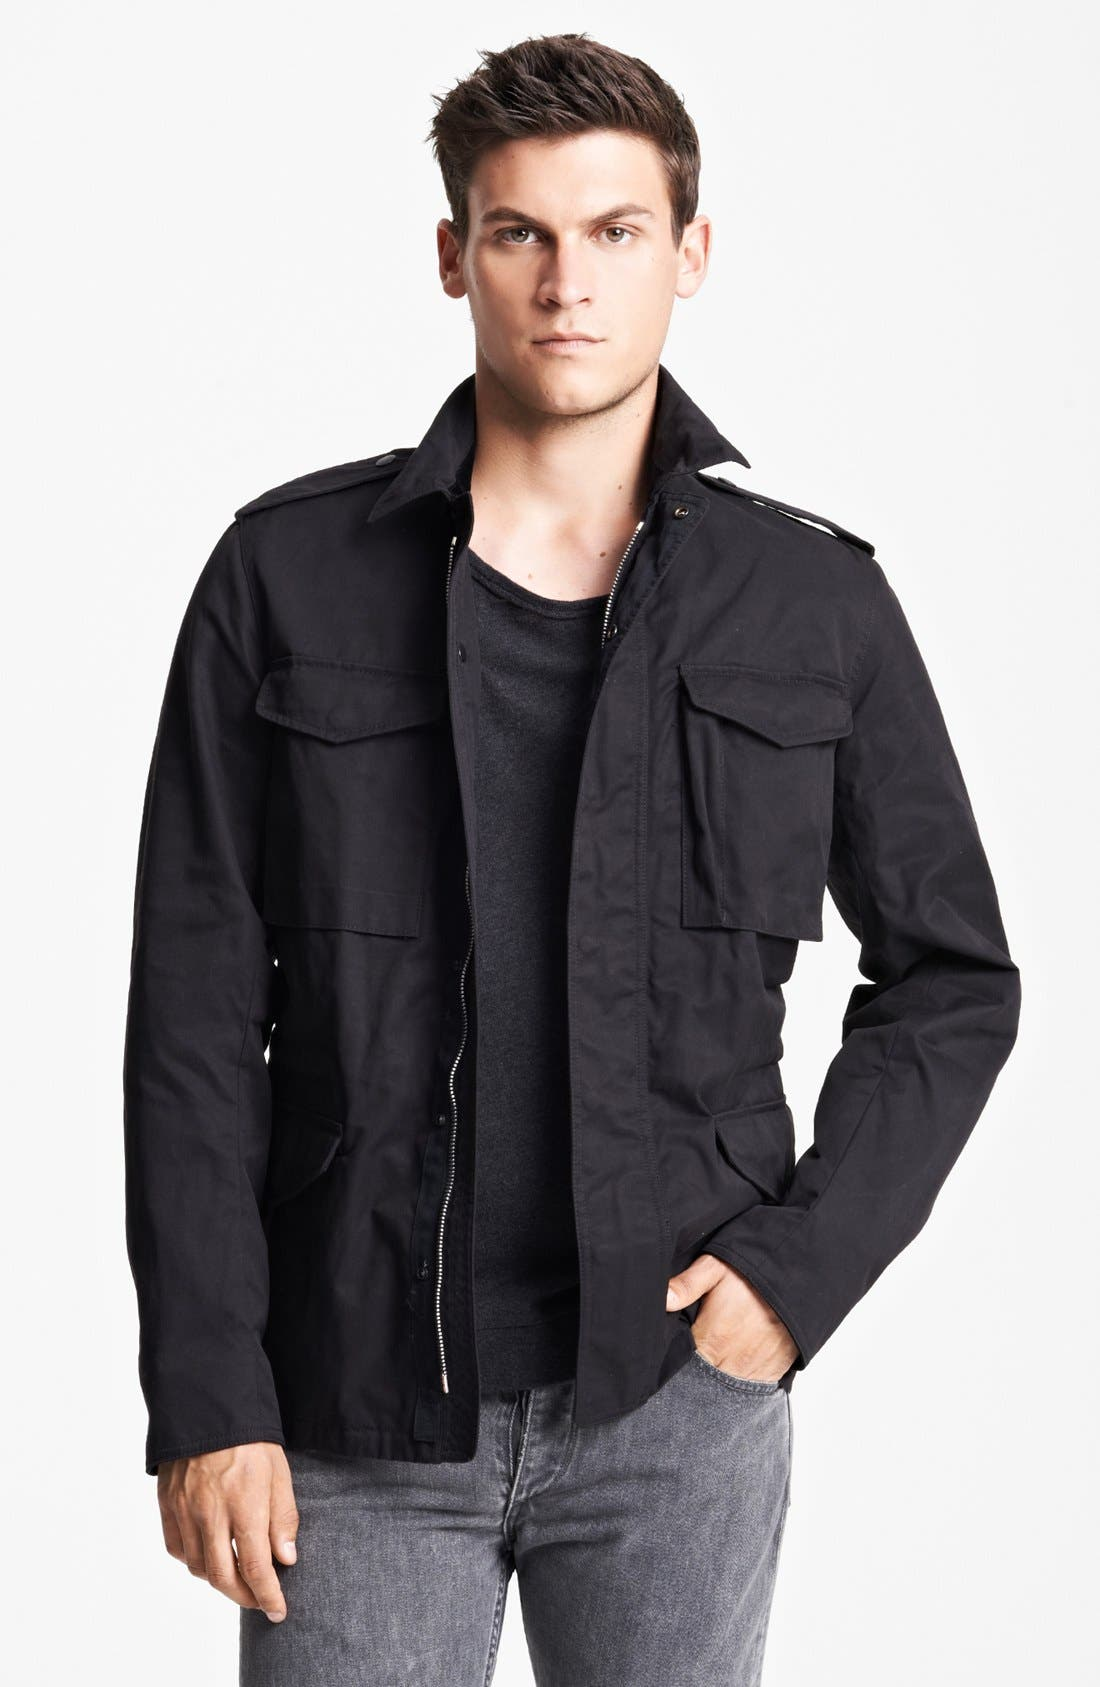 Alternate Image 1 Selected - rag & bone 'Delancy' Jacket